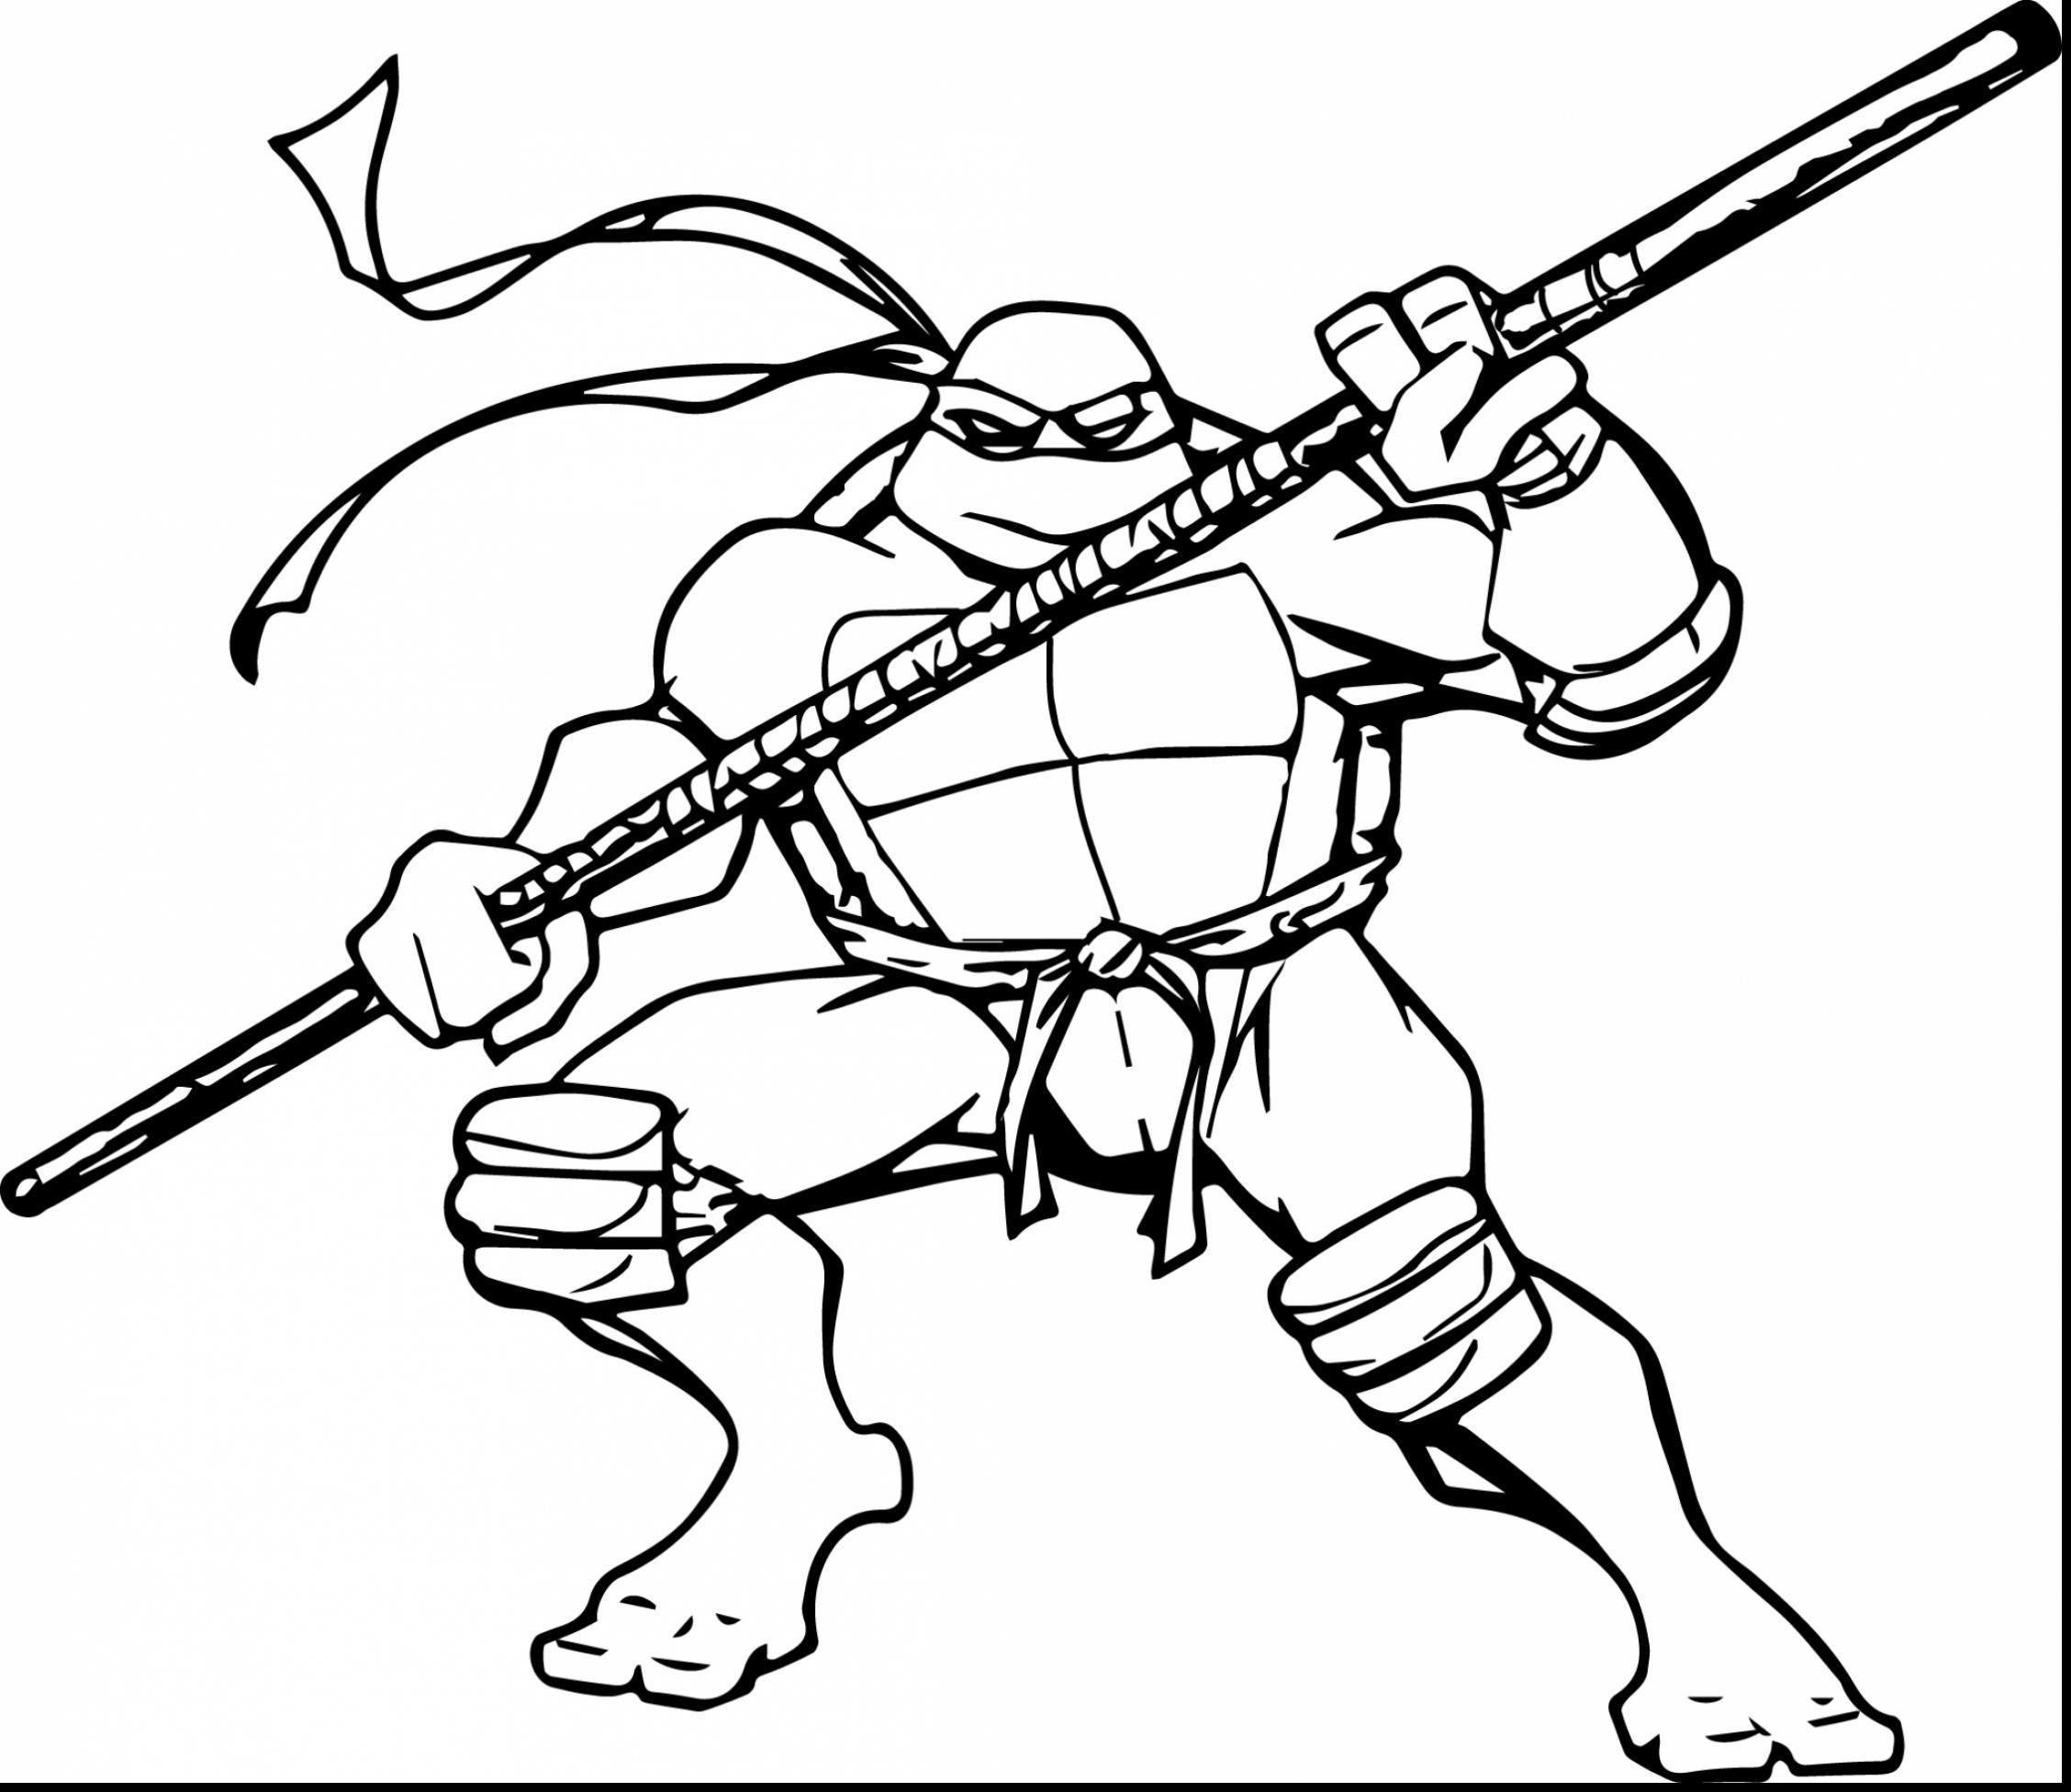 2256x1952 Unbelievable Teenage Mutant Ninja Turtles Coloring Pages With Tmnt